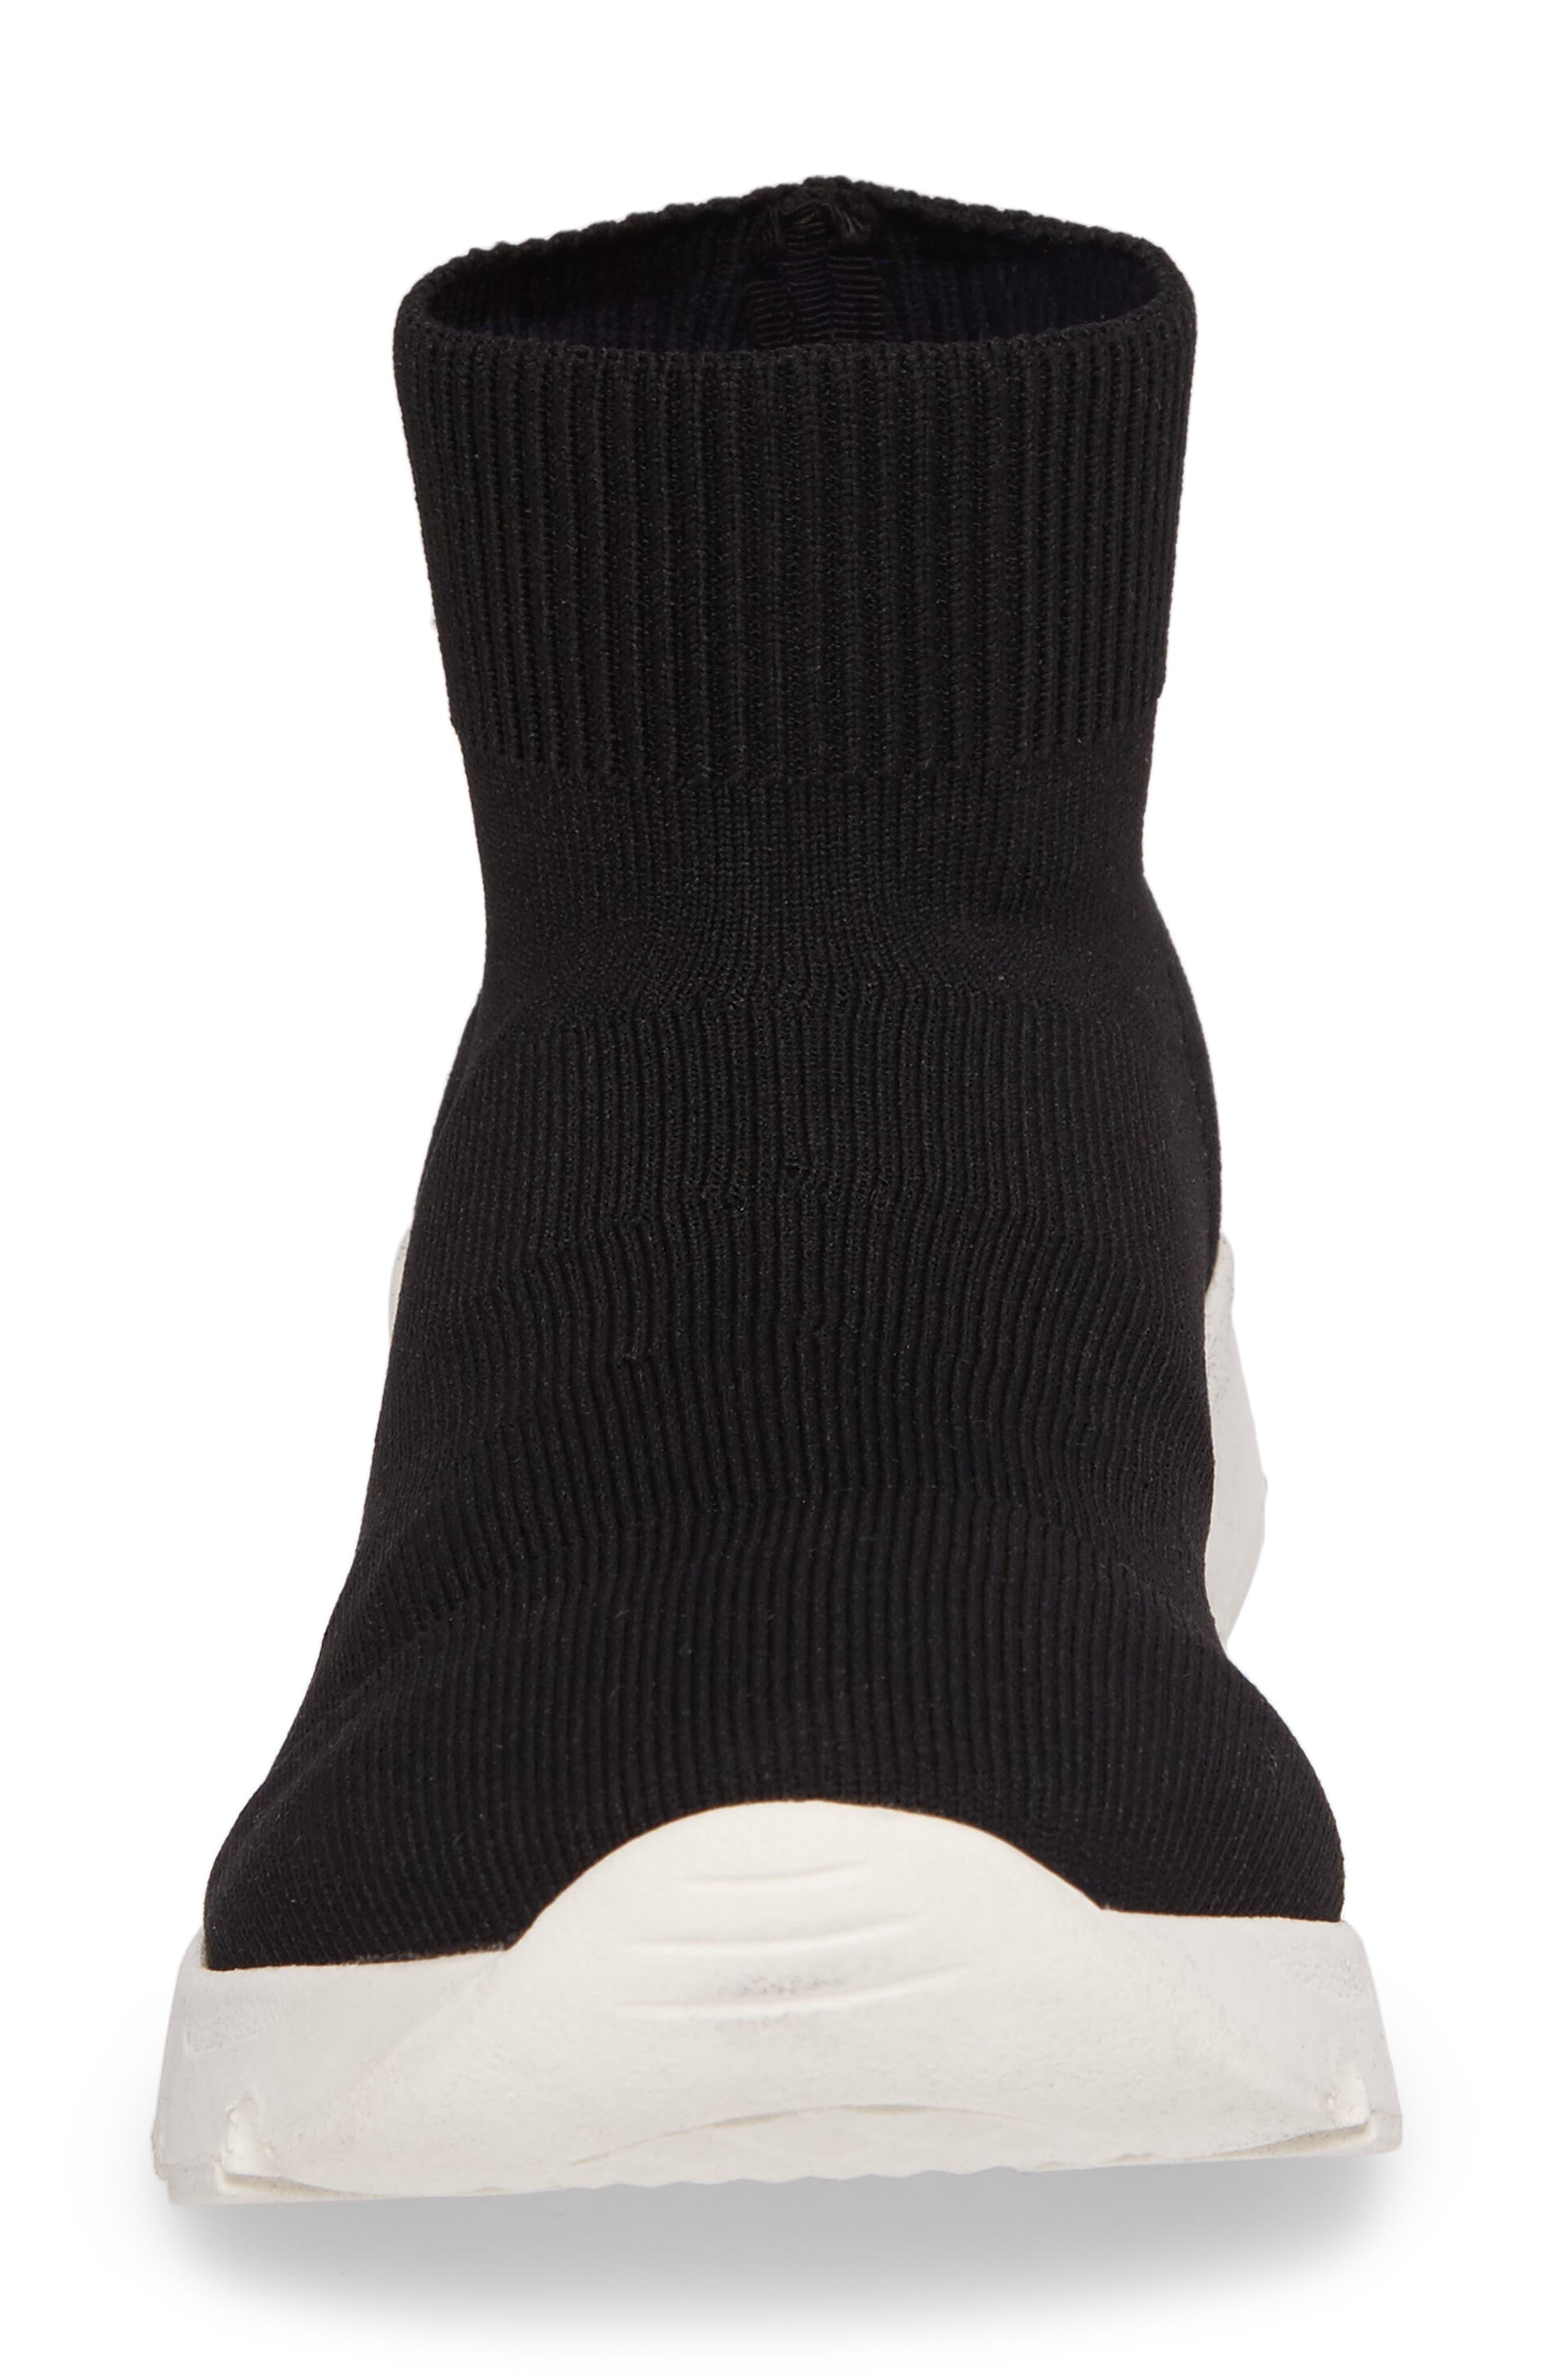 Winston Knit High Top Sneaker,                             Alternate thumbnail 4, color,                             001